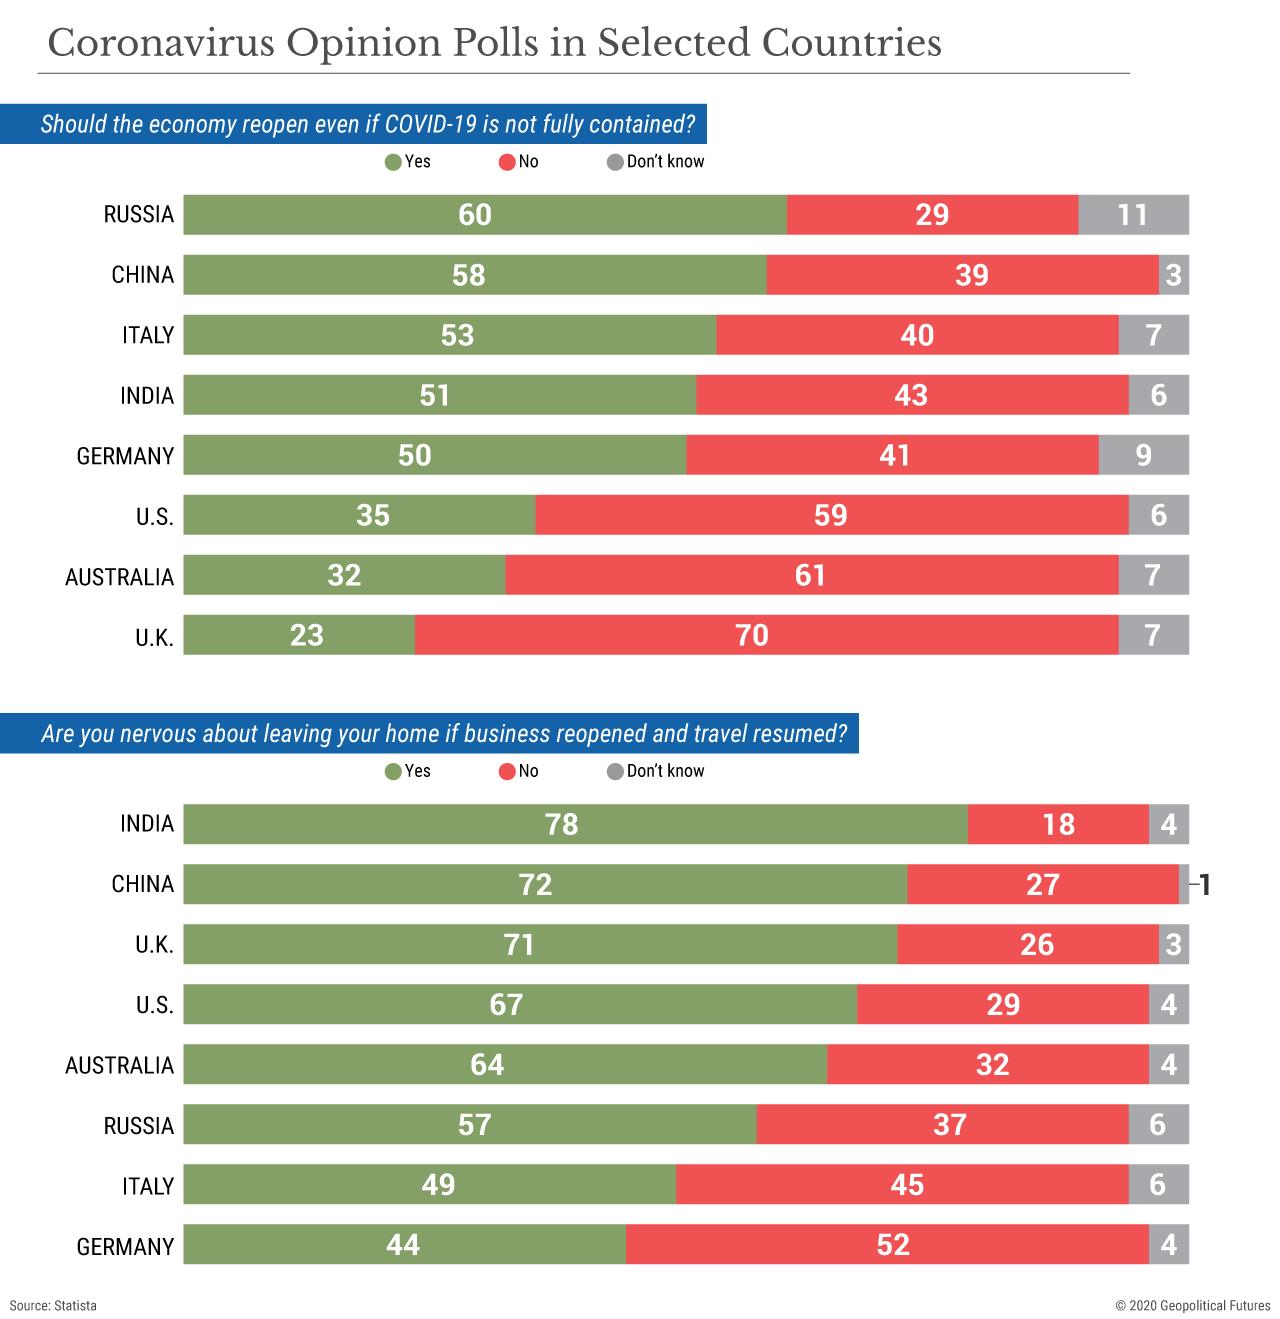 Coronavirus Opinion Polls in Selected Countries